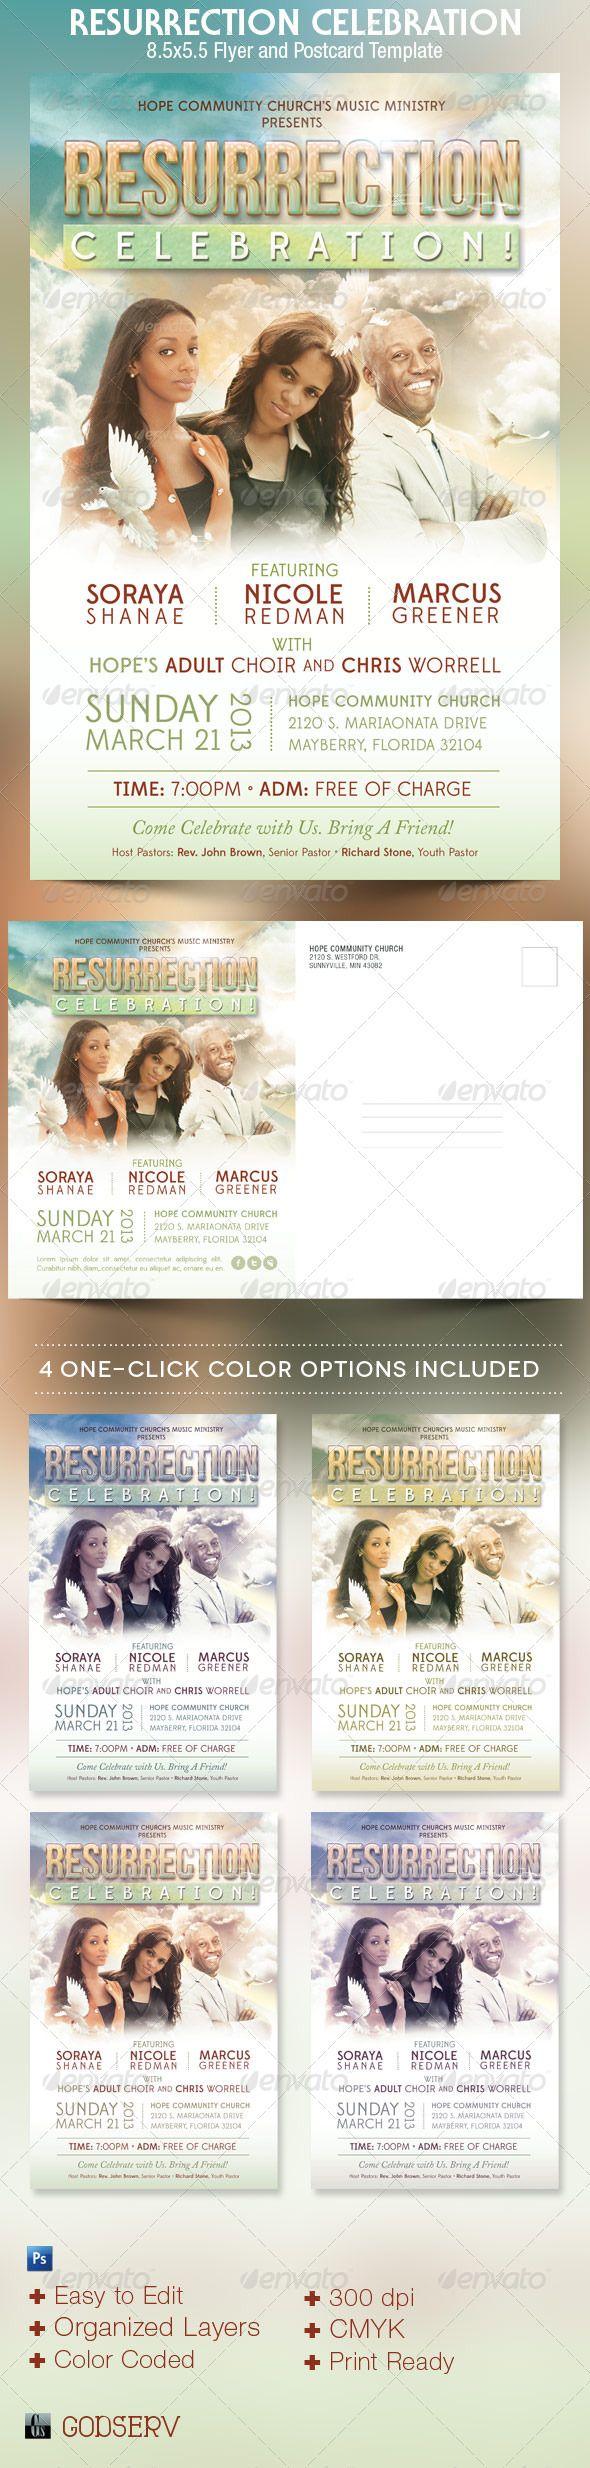 Resurrection Celebration Church Flyer Template  - Church Flyers